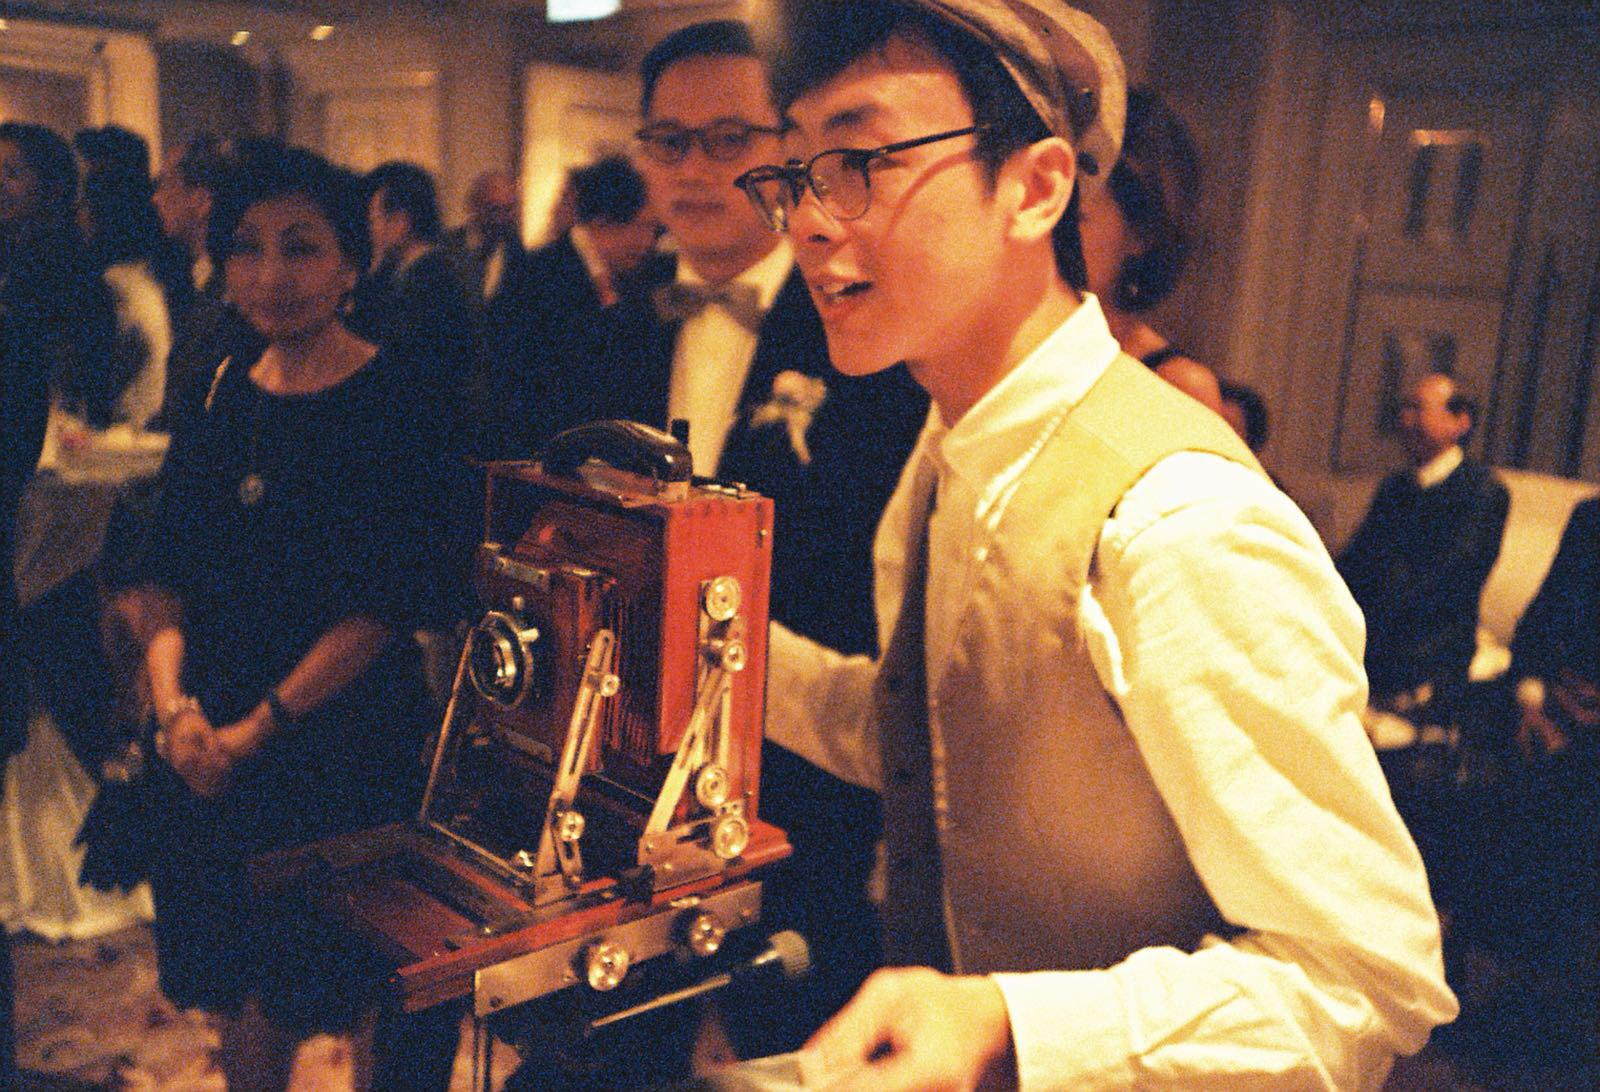 INSTANT PHOTO BOOTH - 流動寫真館將古董木頭機設置於宴會現場,為賓客提供一趟傳統攝影體驗。場地佈置 ・ 活動體驗 ・ 回禮禮物,三合一的新意念!